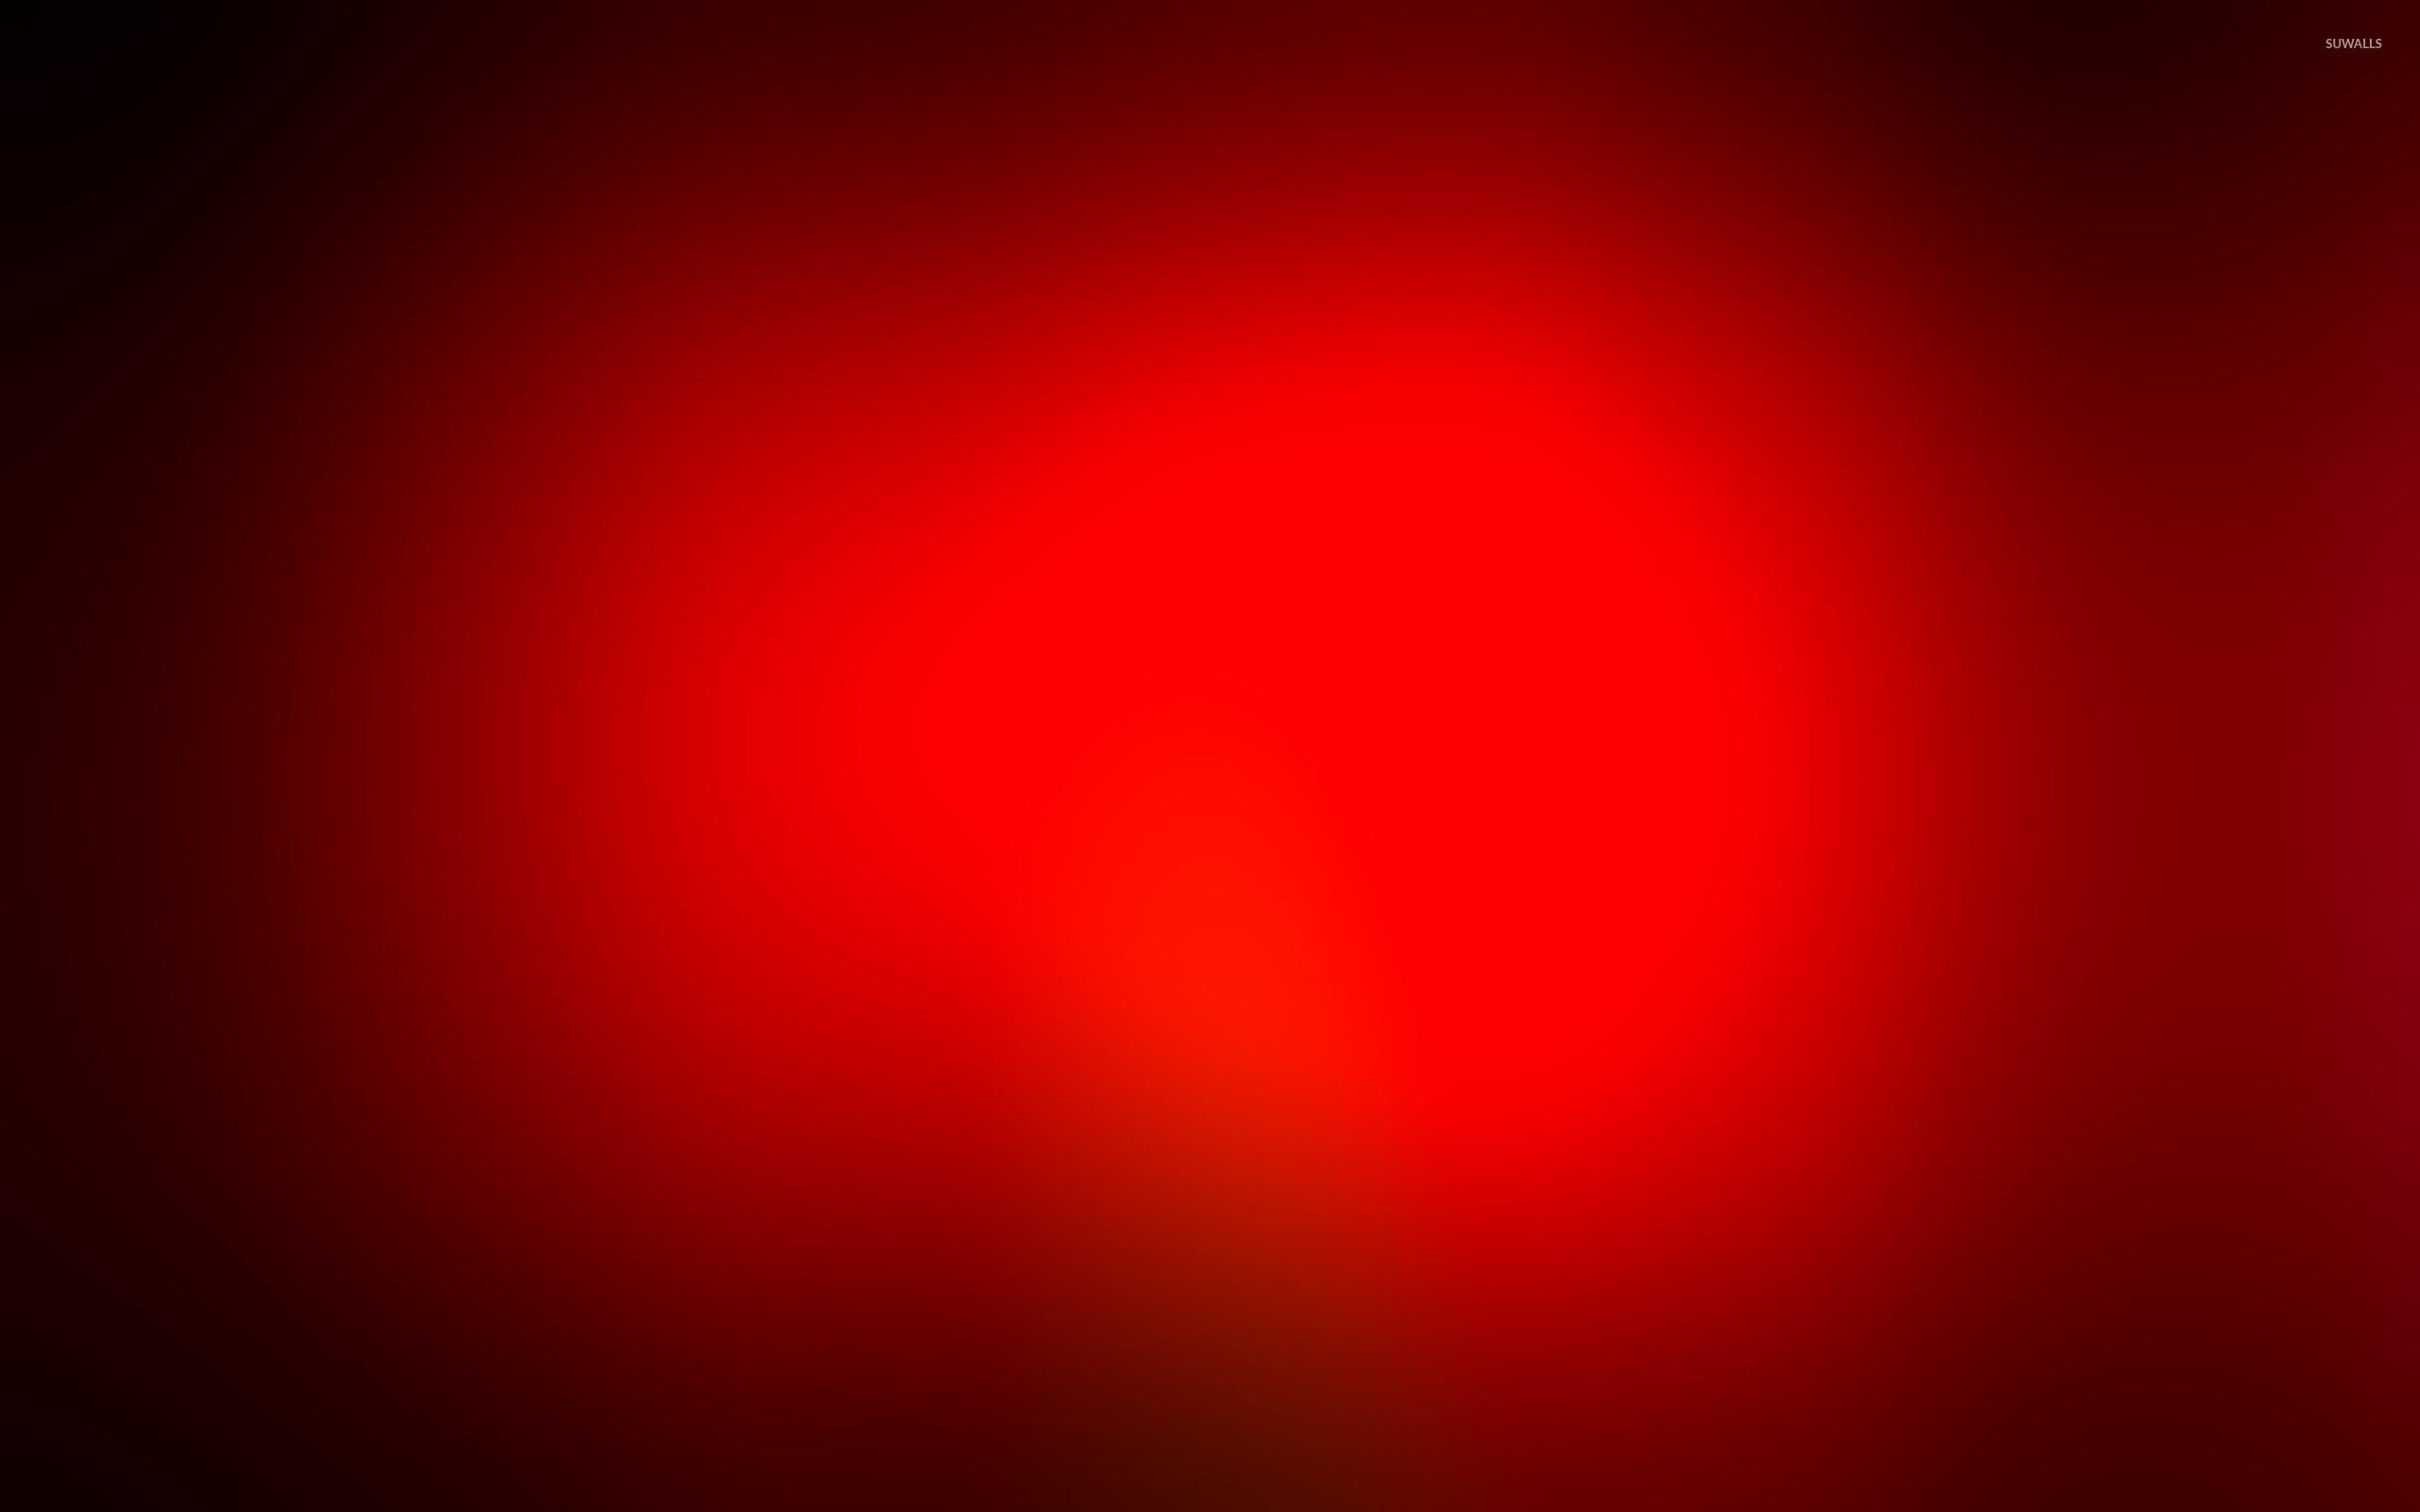 Red gradient wallpaper jpg